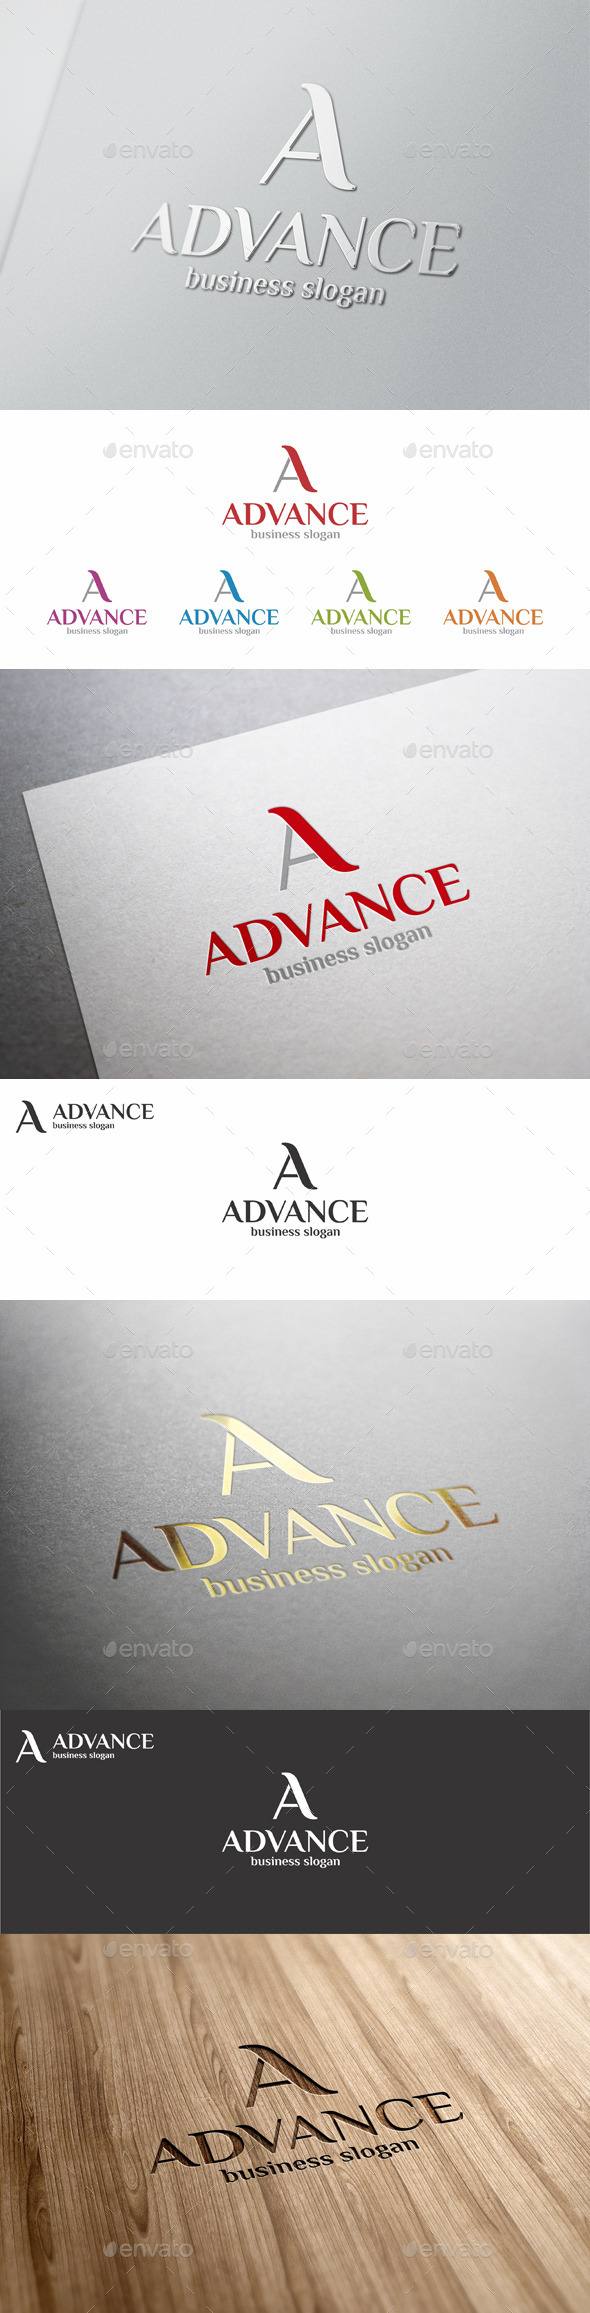 A Logo Letter Template - Advance